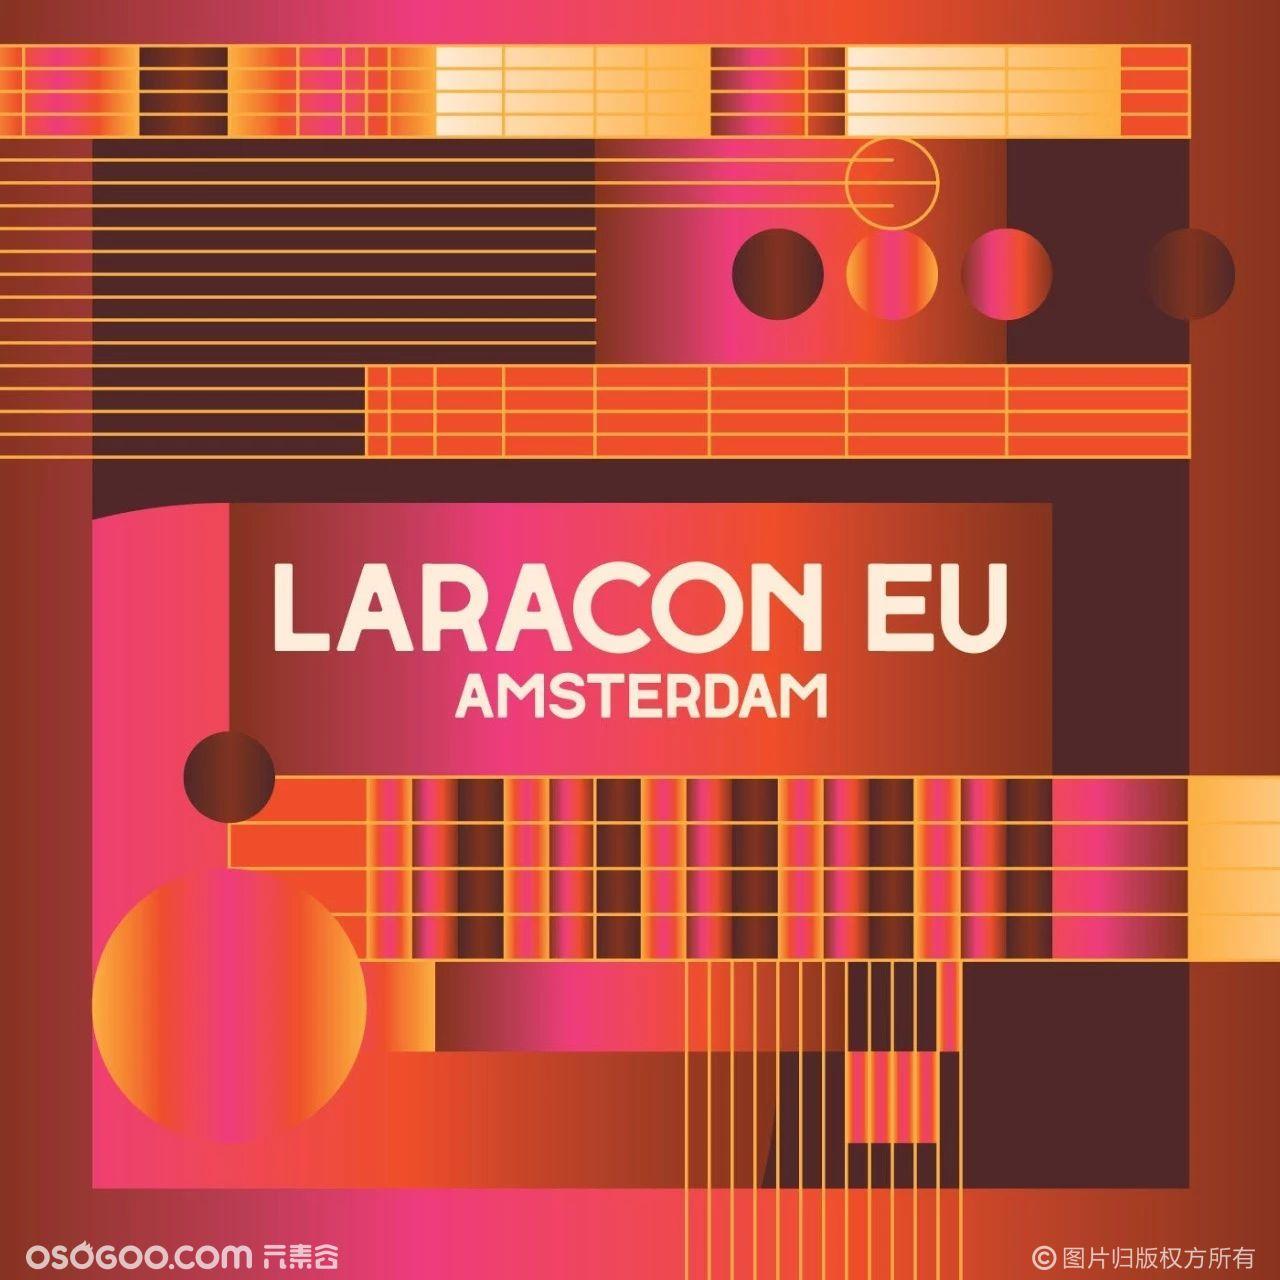 2019 LaraconEU 开发者大会视觉形象设计